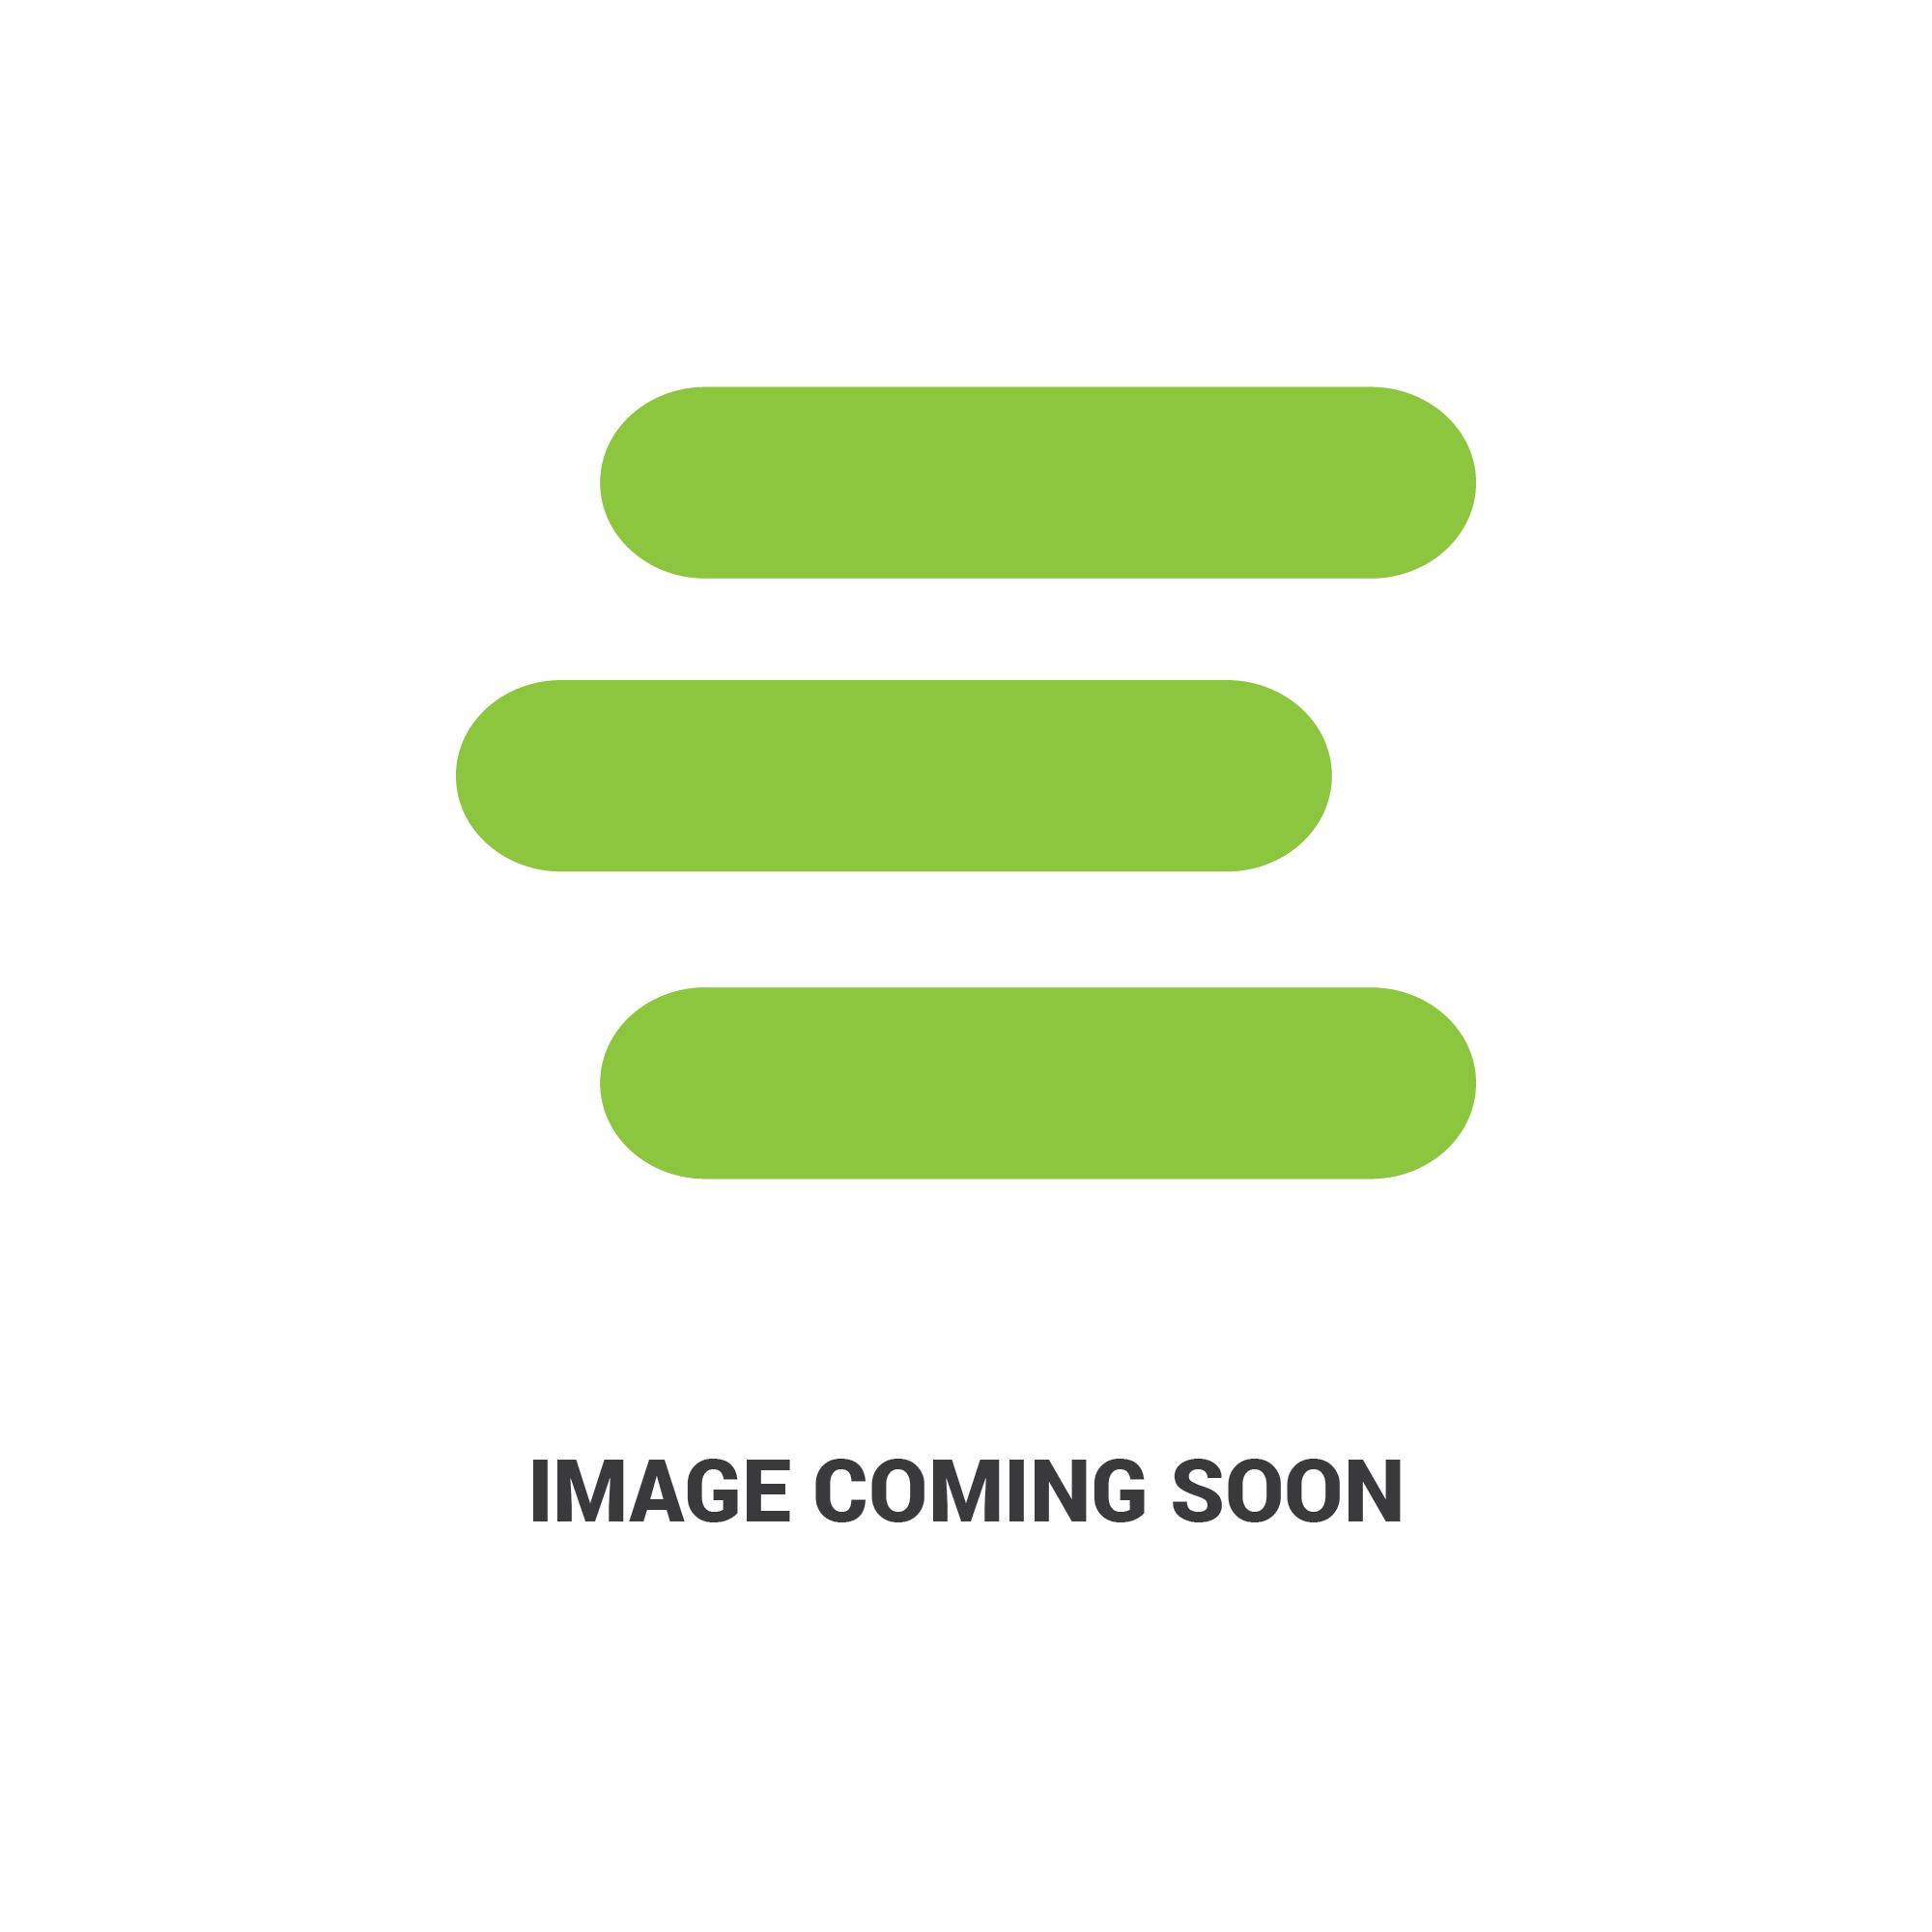 E-6733652edit 1.jpg